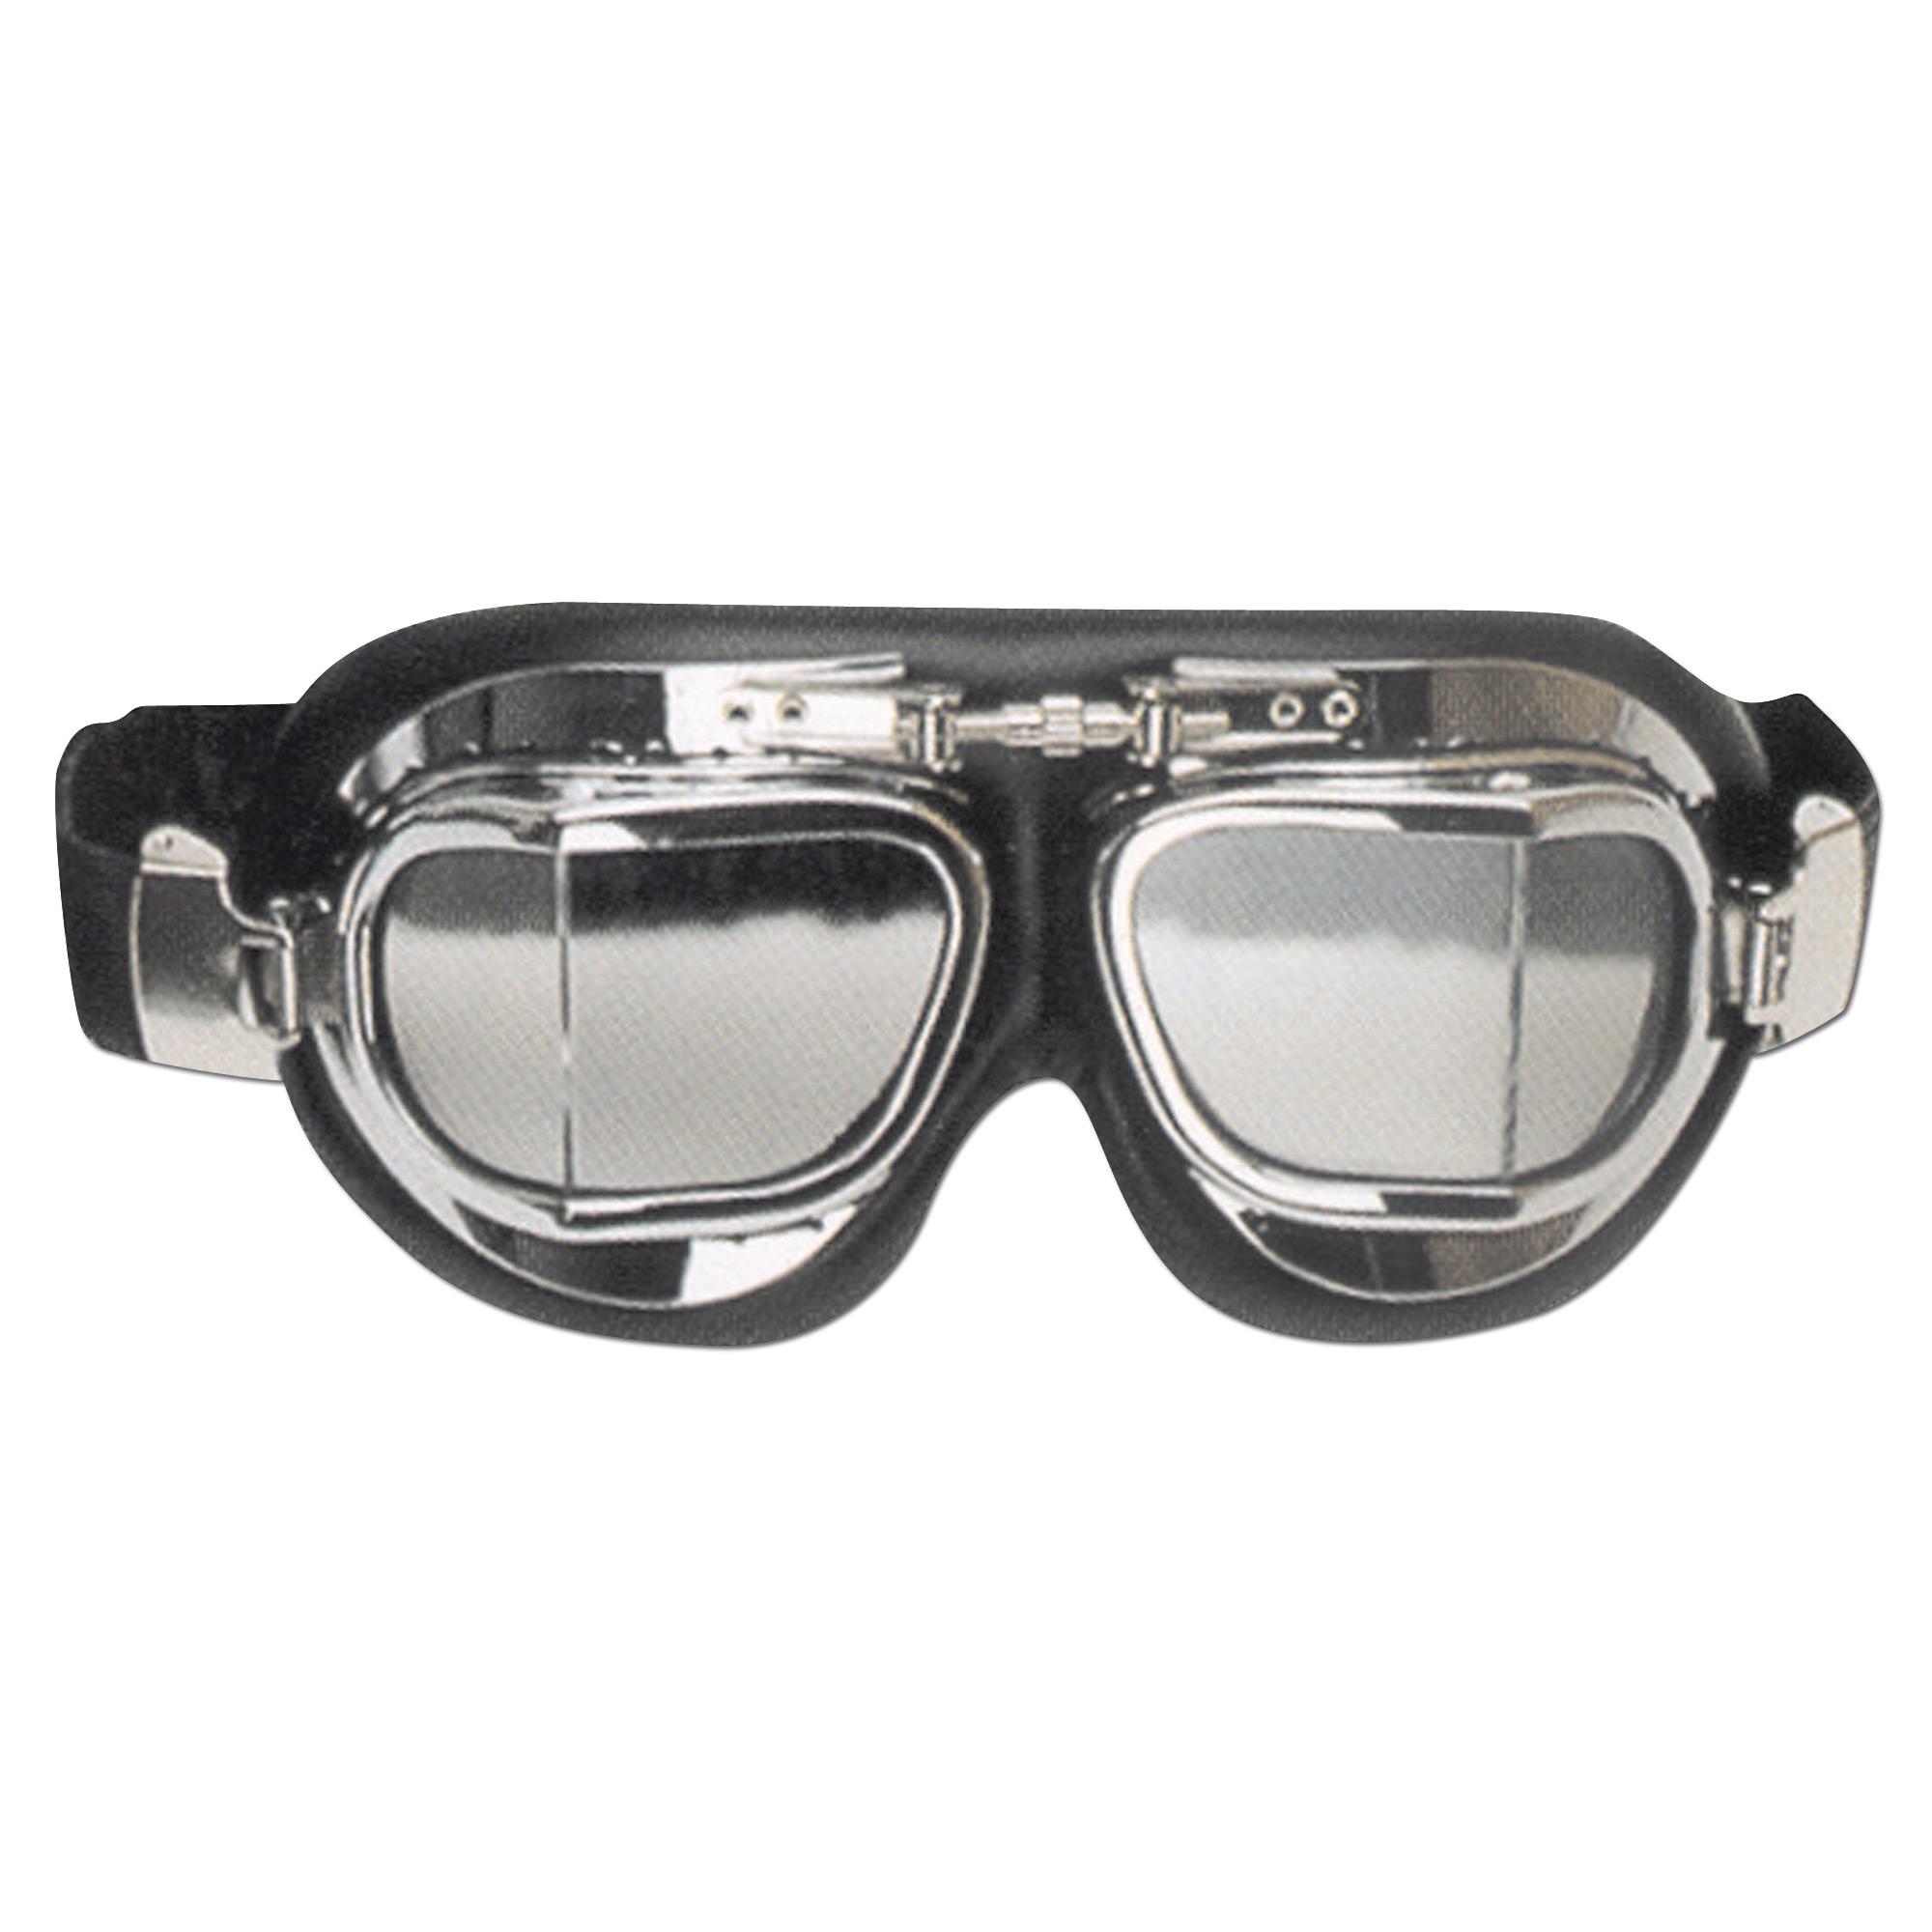 Fliegerbrille RAF verchromtes Gestell